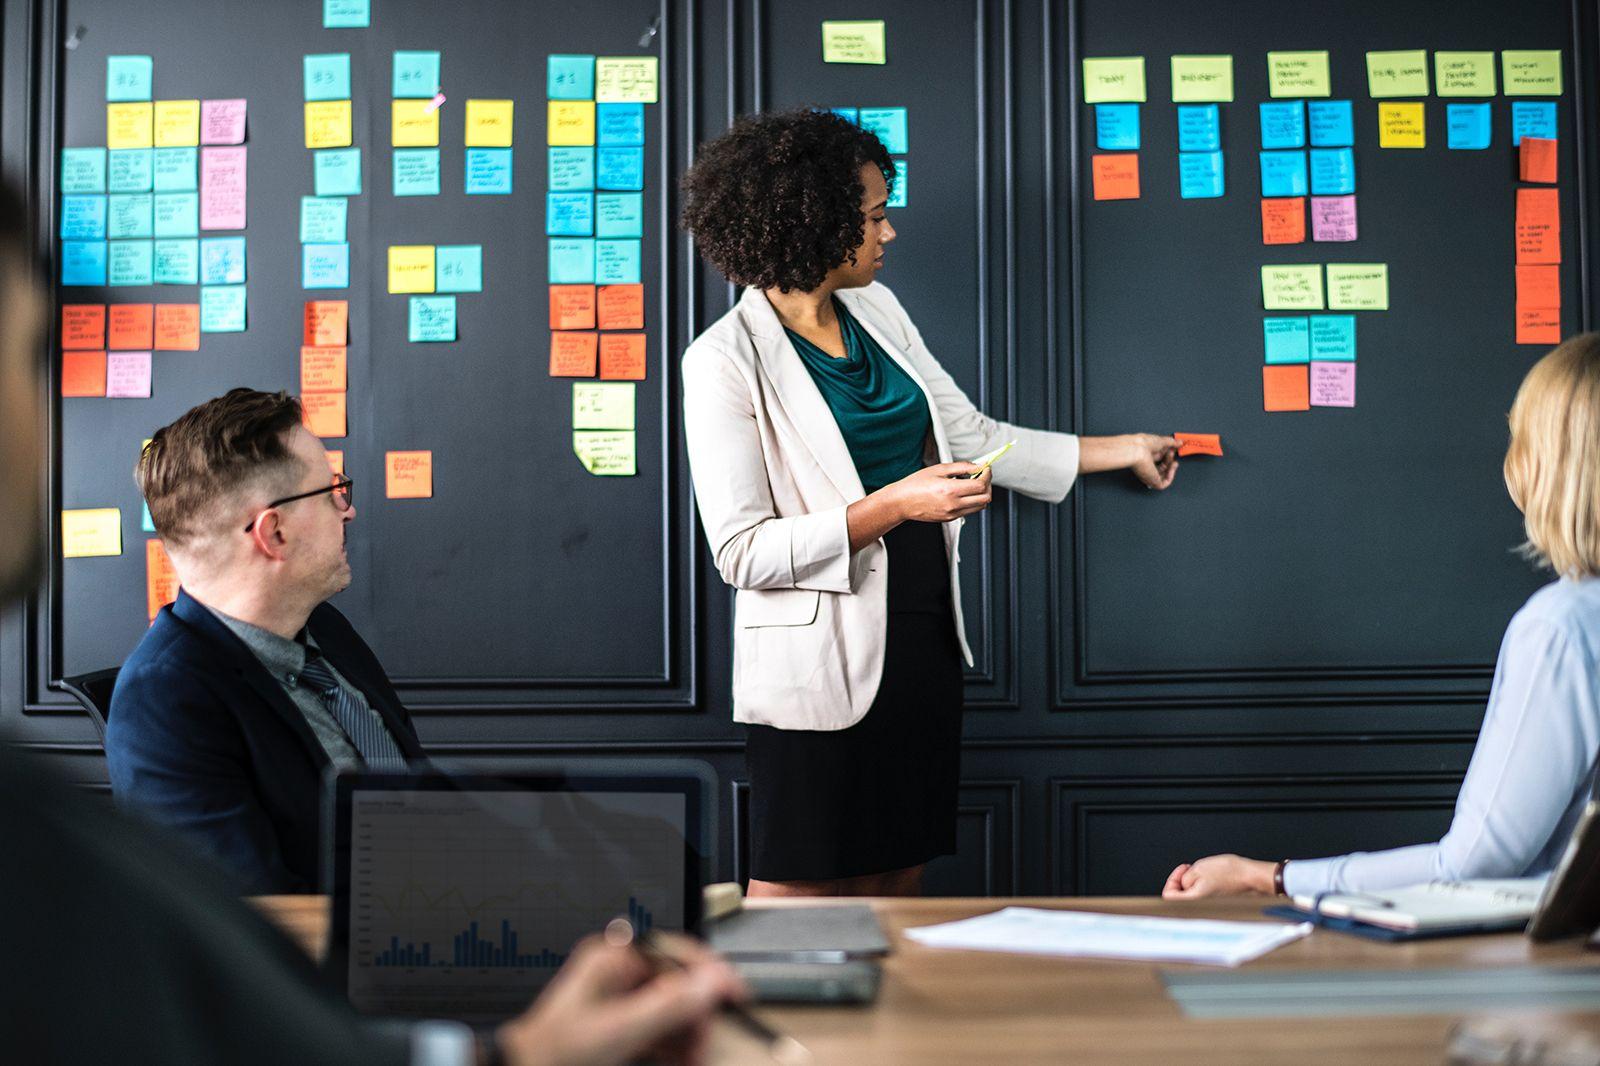 frame governance for an Agile meeting